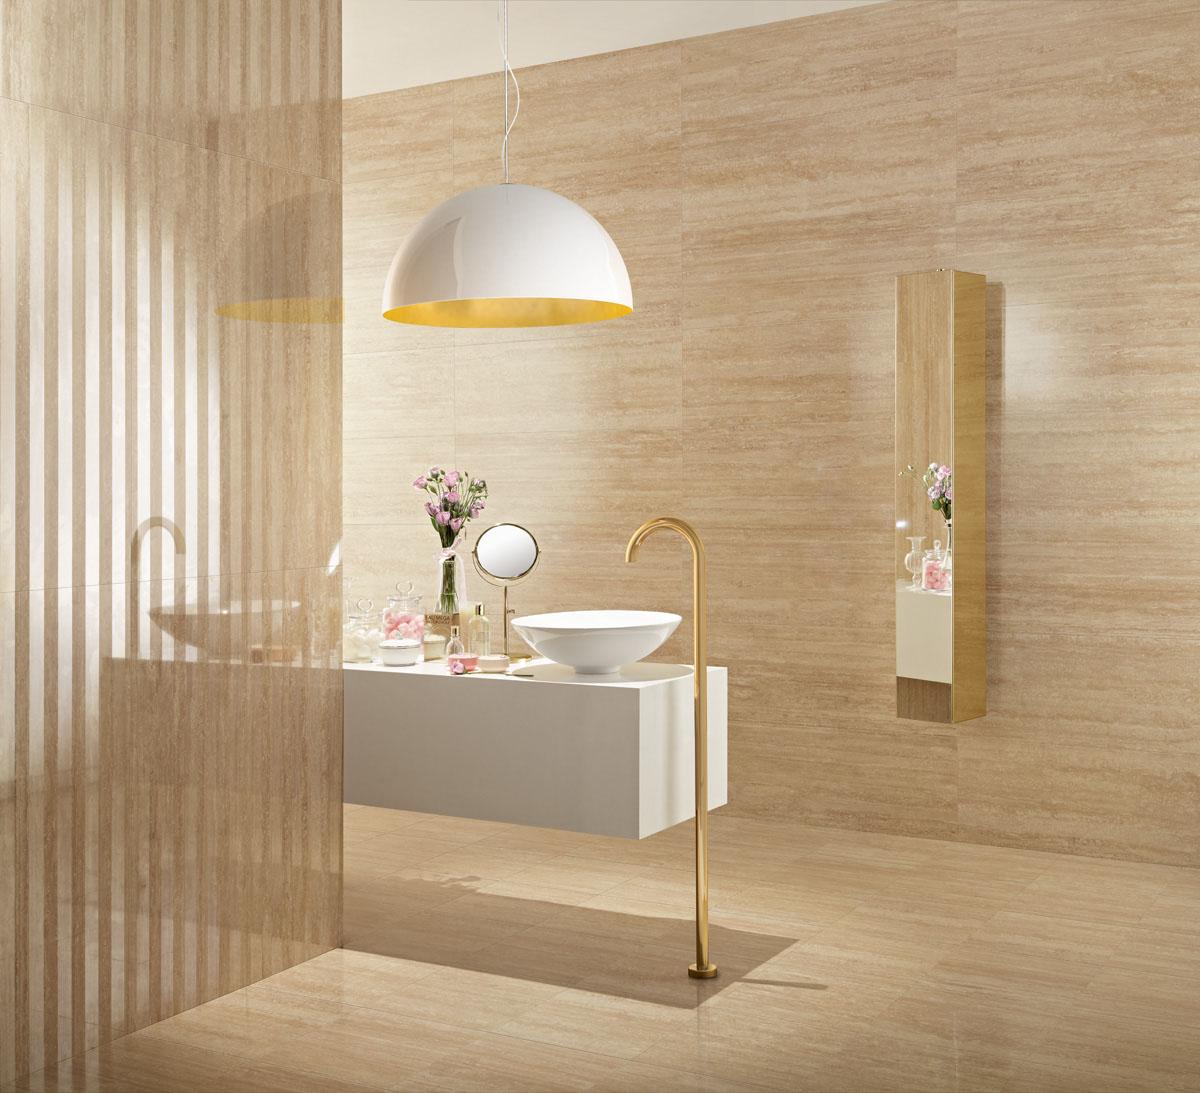 Luminaire Salle De Bain Mr Bricolage ~ royale lipica flex beige dor mail